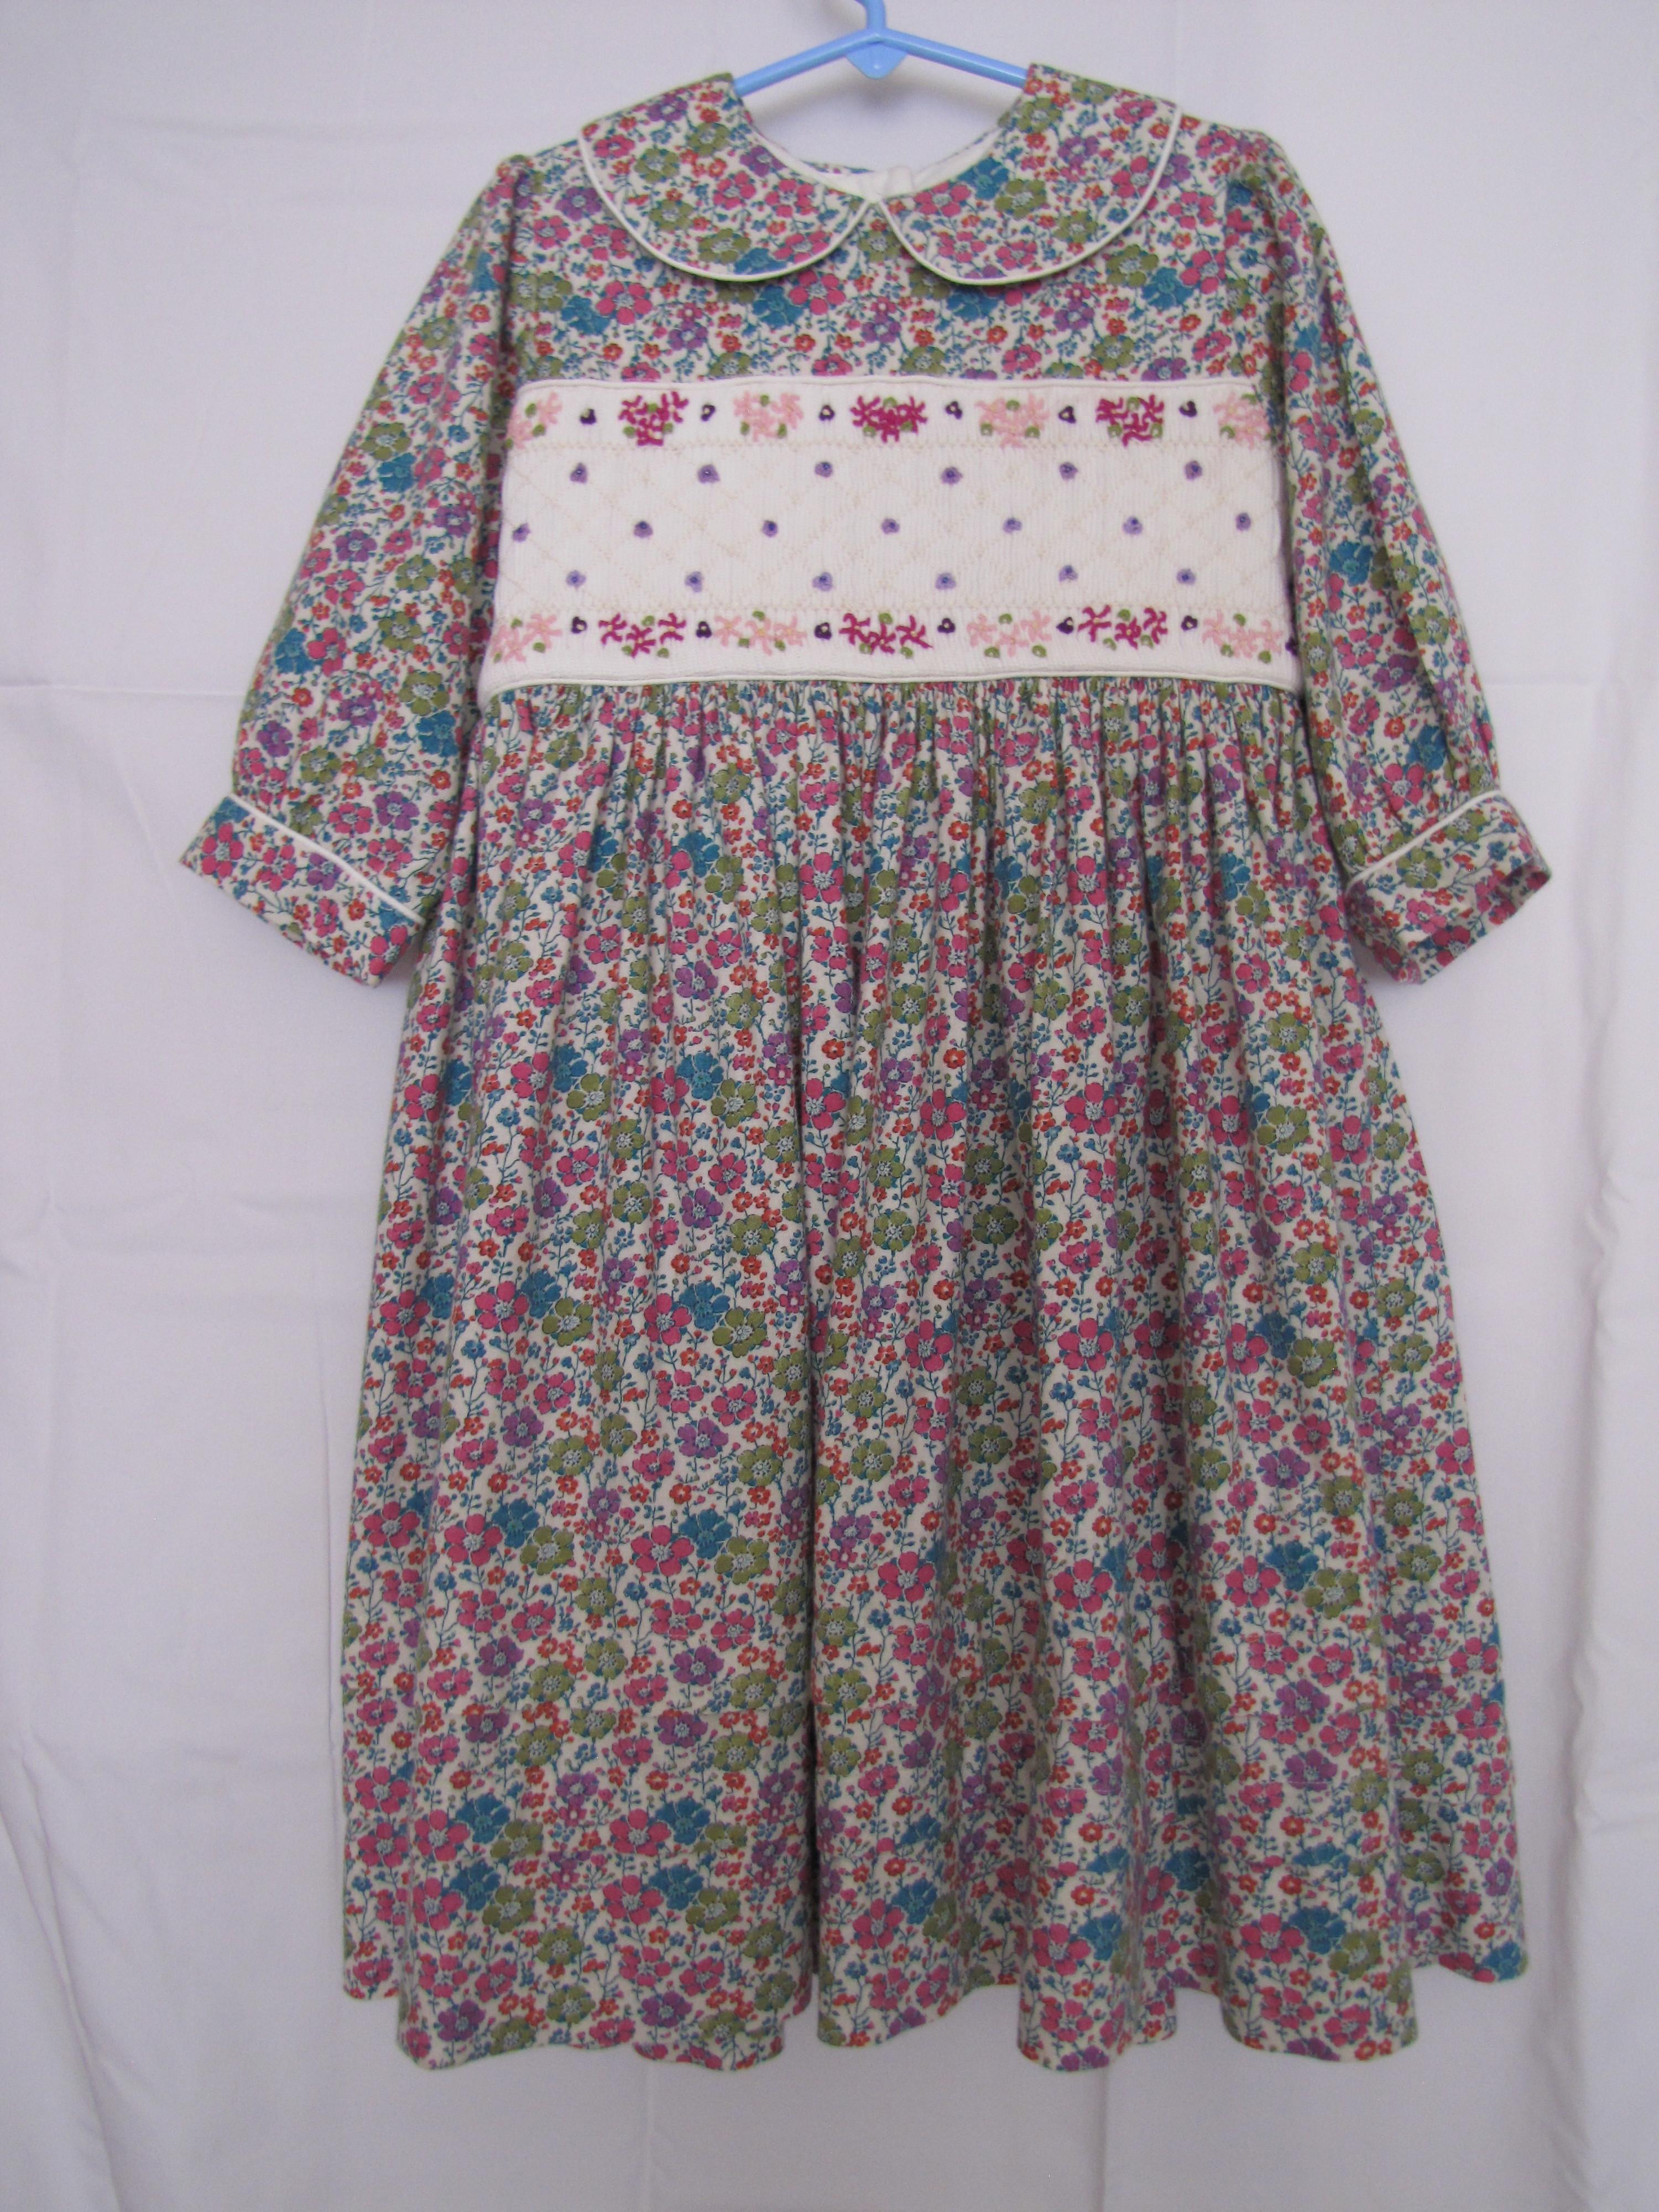 Floral Liberty Print Dress